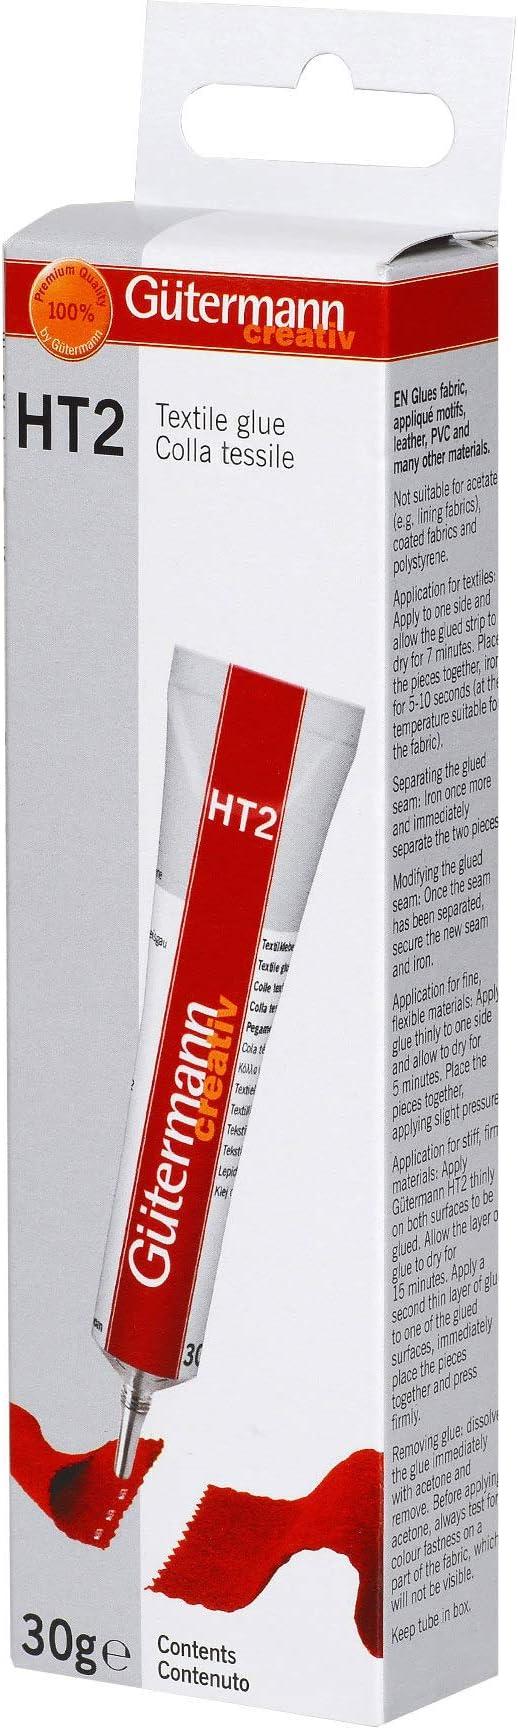 Glue Gutermann Textile Ht2 Tube 30g Fabric Factory Solvent Creativ Original